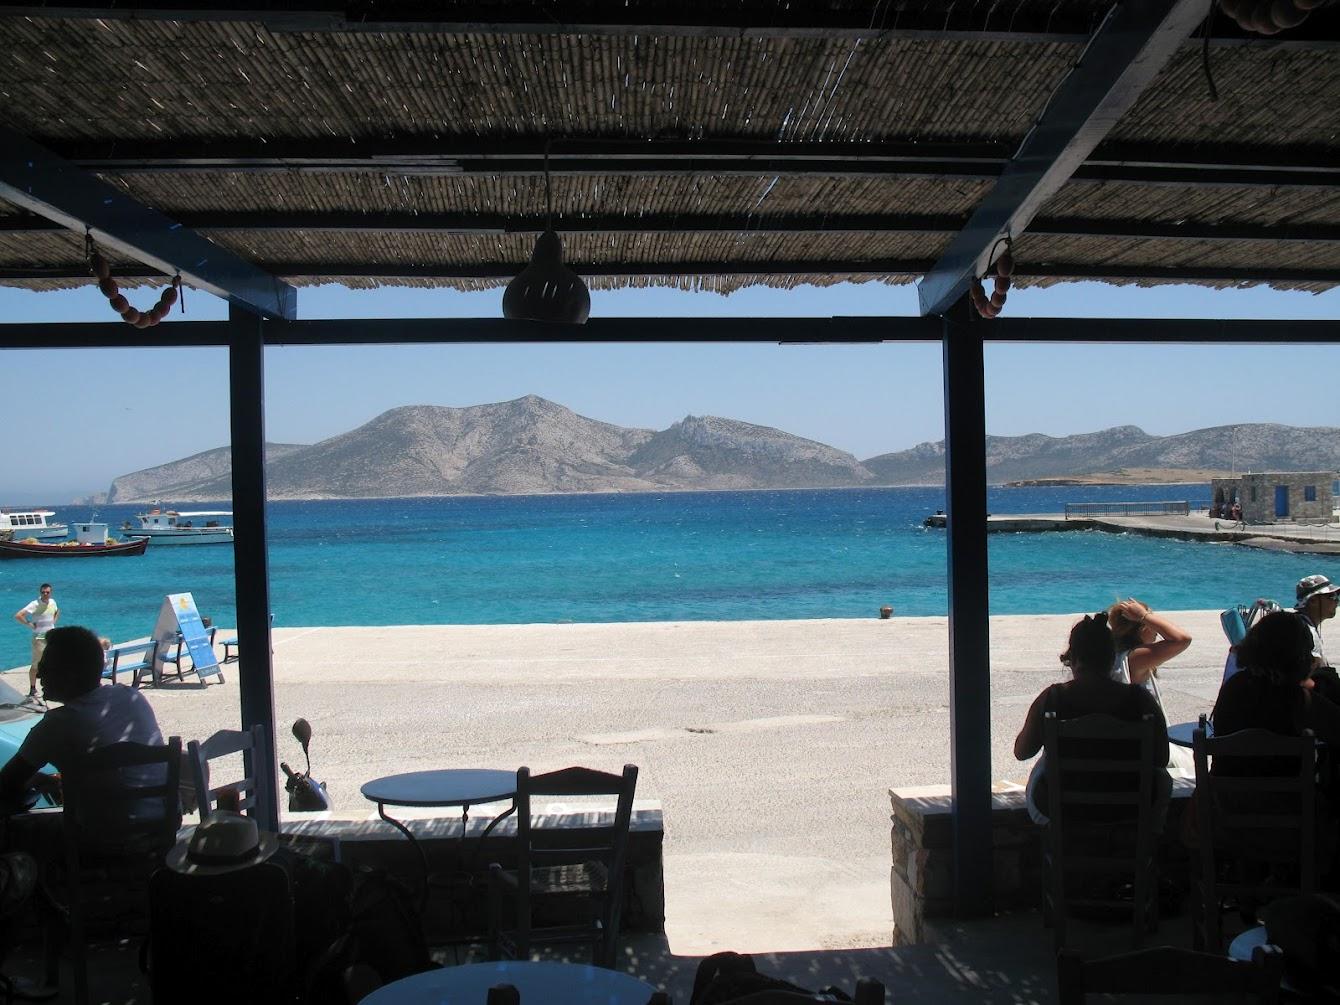 Grecia (I): Islas Cícladas. De Amorgós a Koufunissi